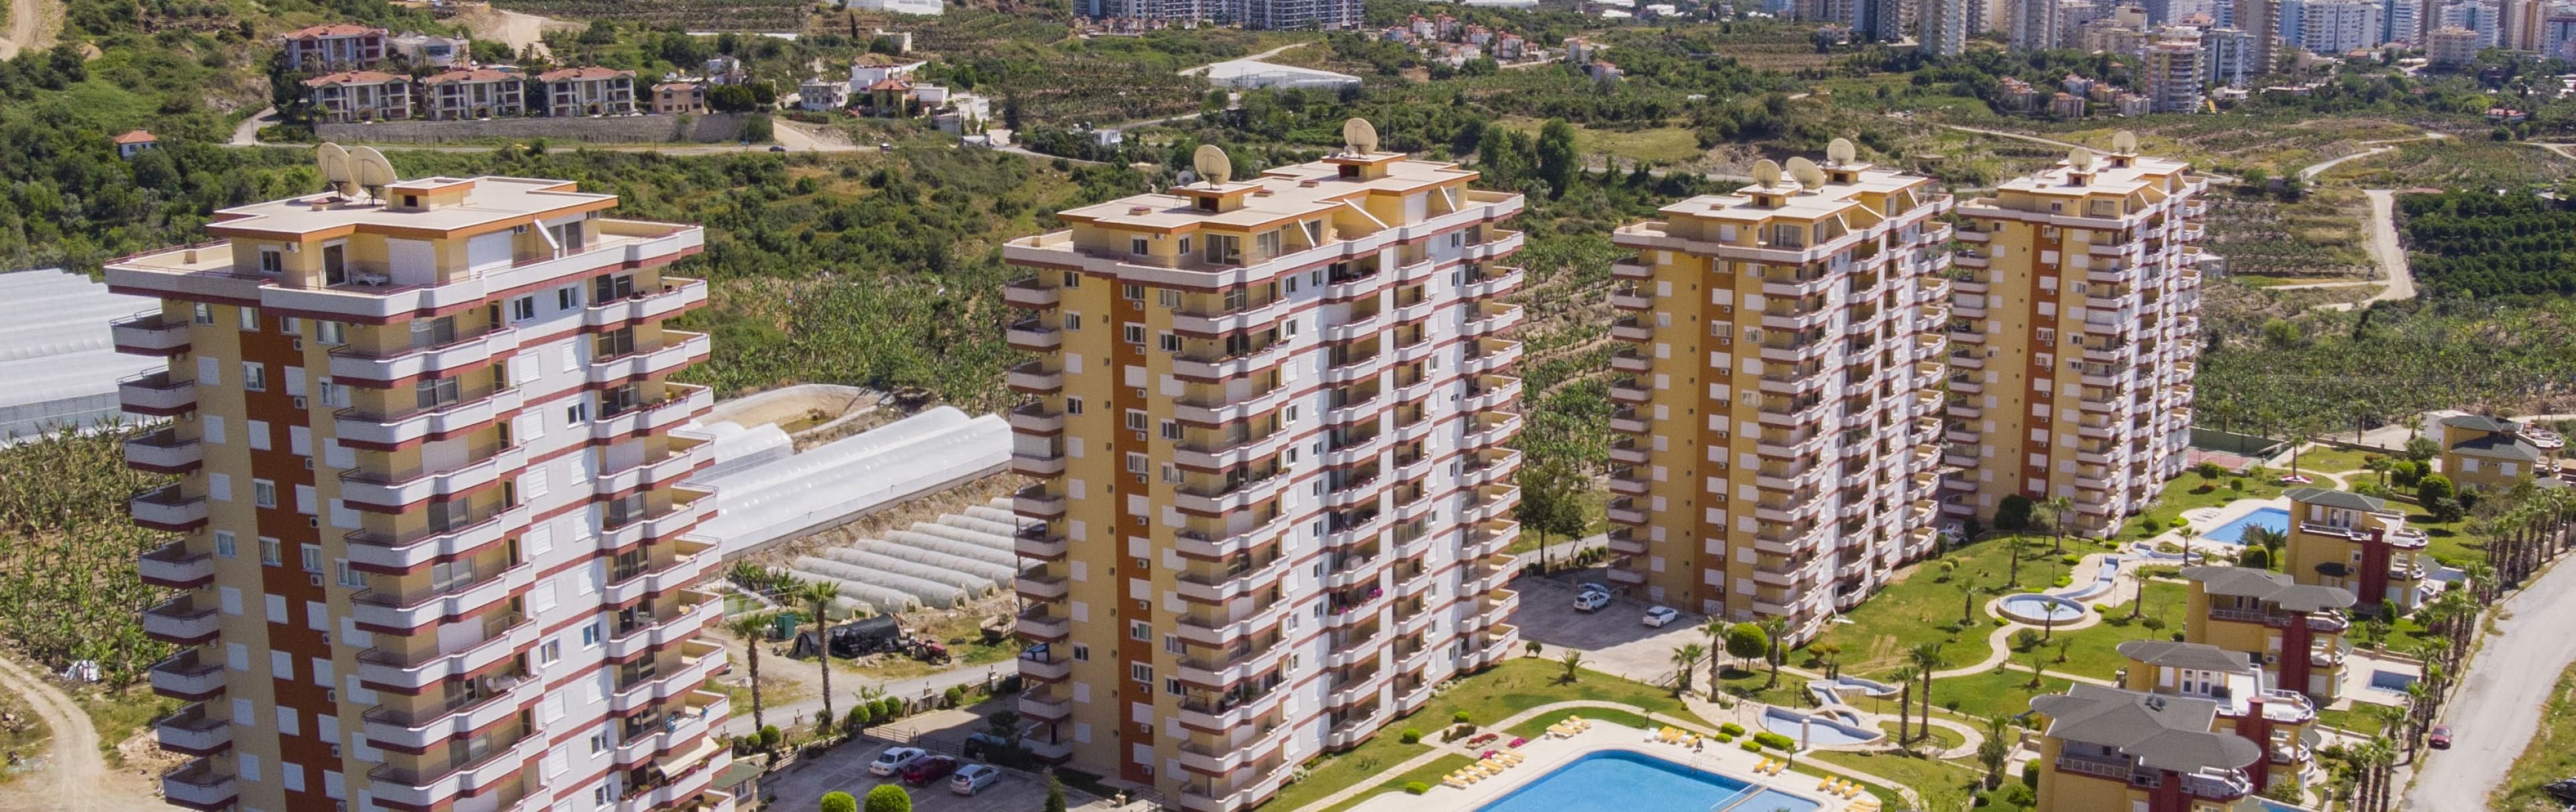 Holiday village apartments